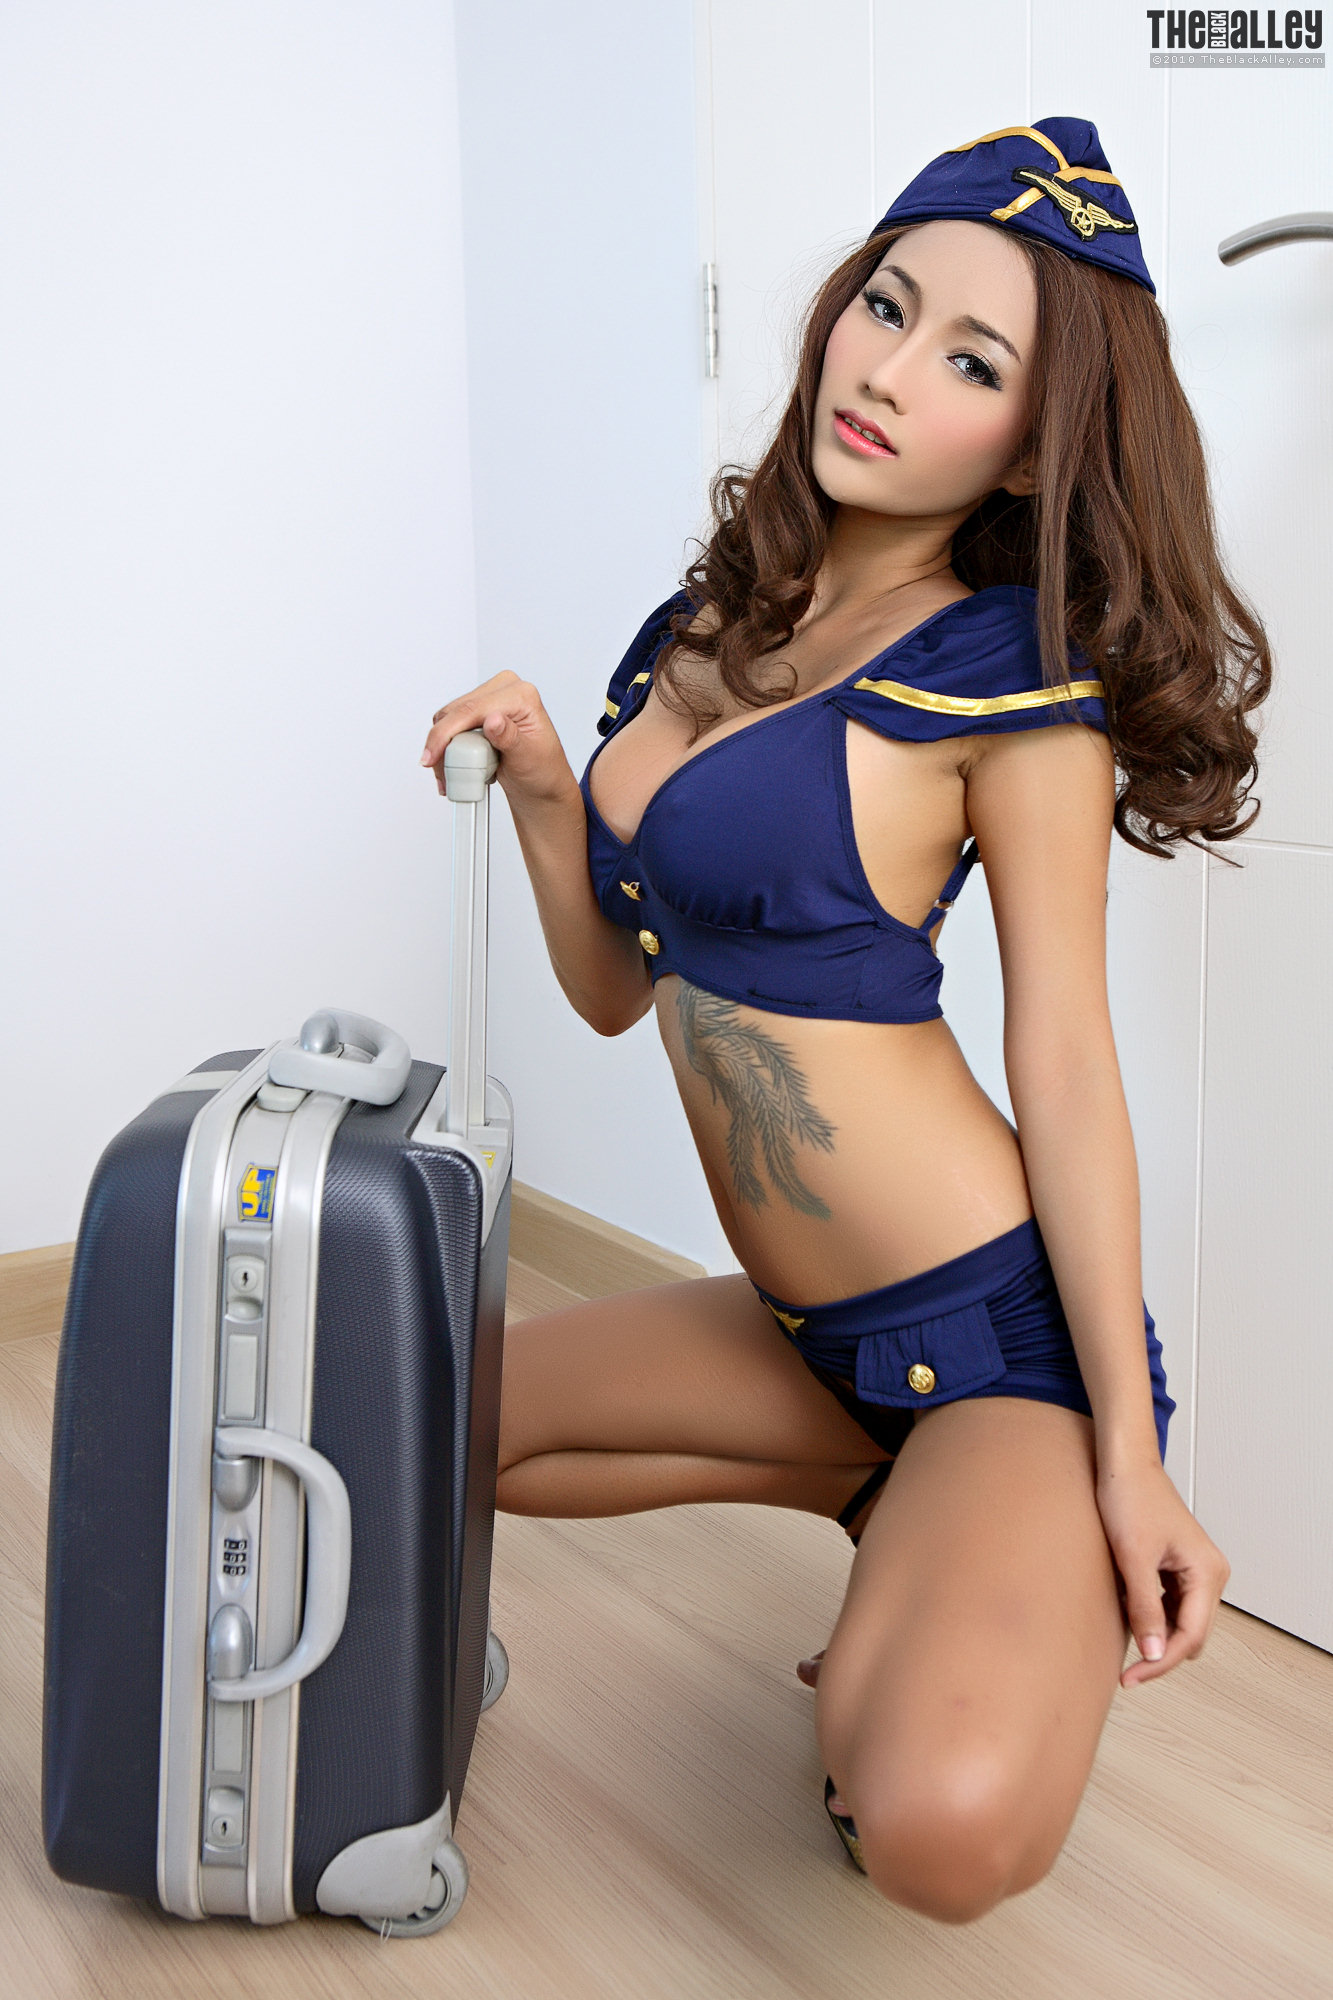 seks-gadis-naked-model-galleries